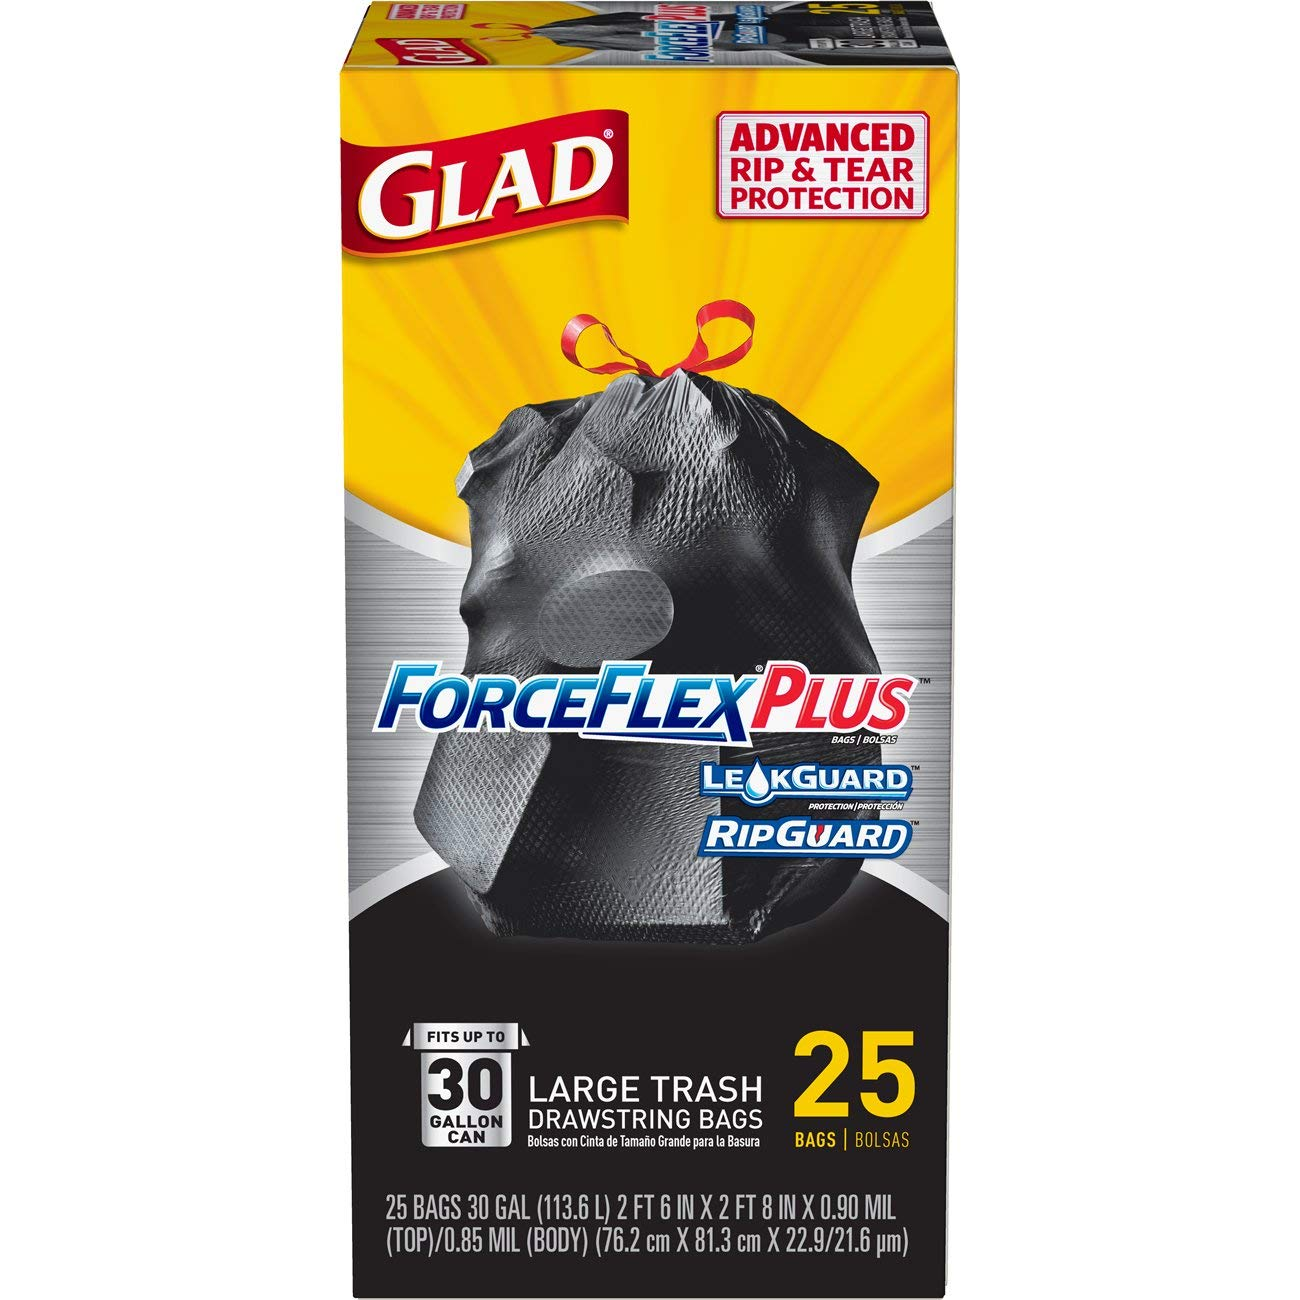 Glad Large Drawstring Trash Bags – ForceFlexPlus 30 Gallon Black Trash Bag - 25 Count